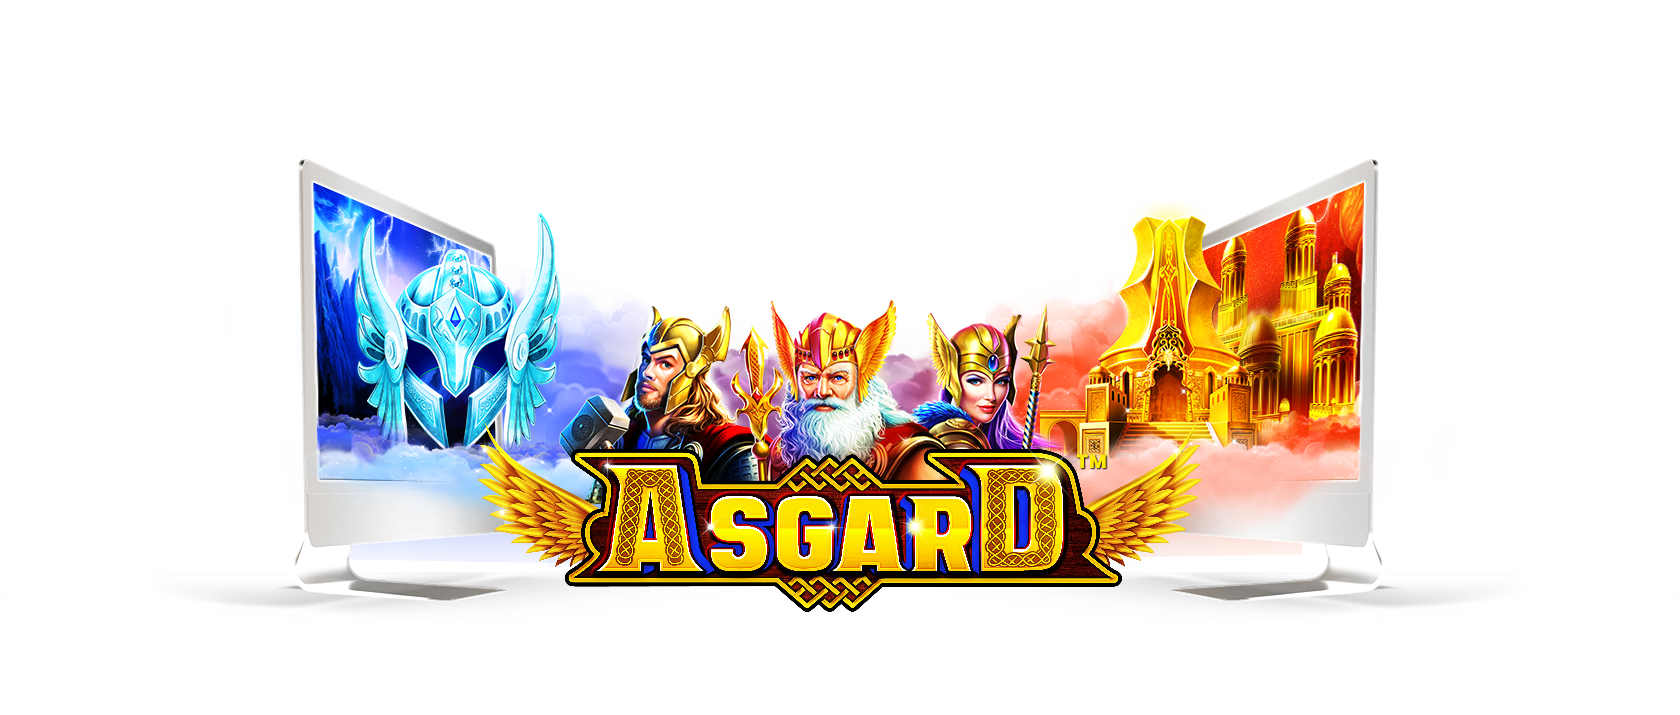 Asgard Pragmatic Play Games